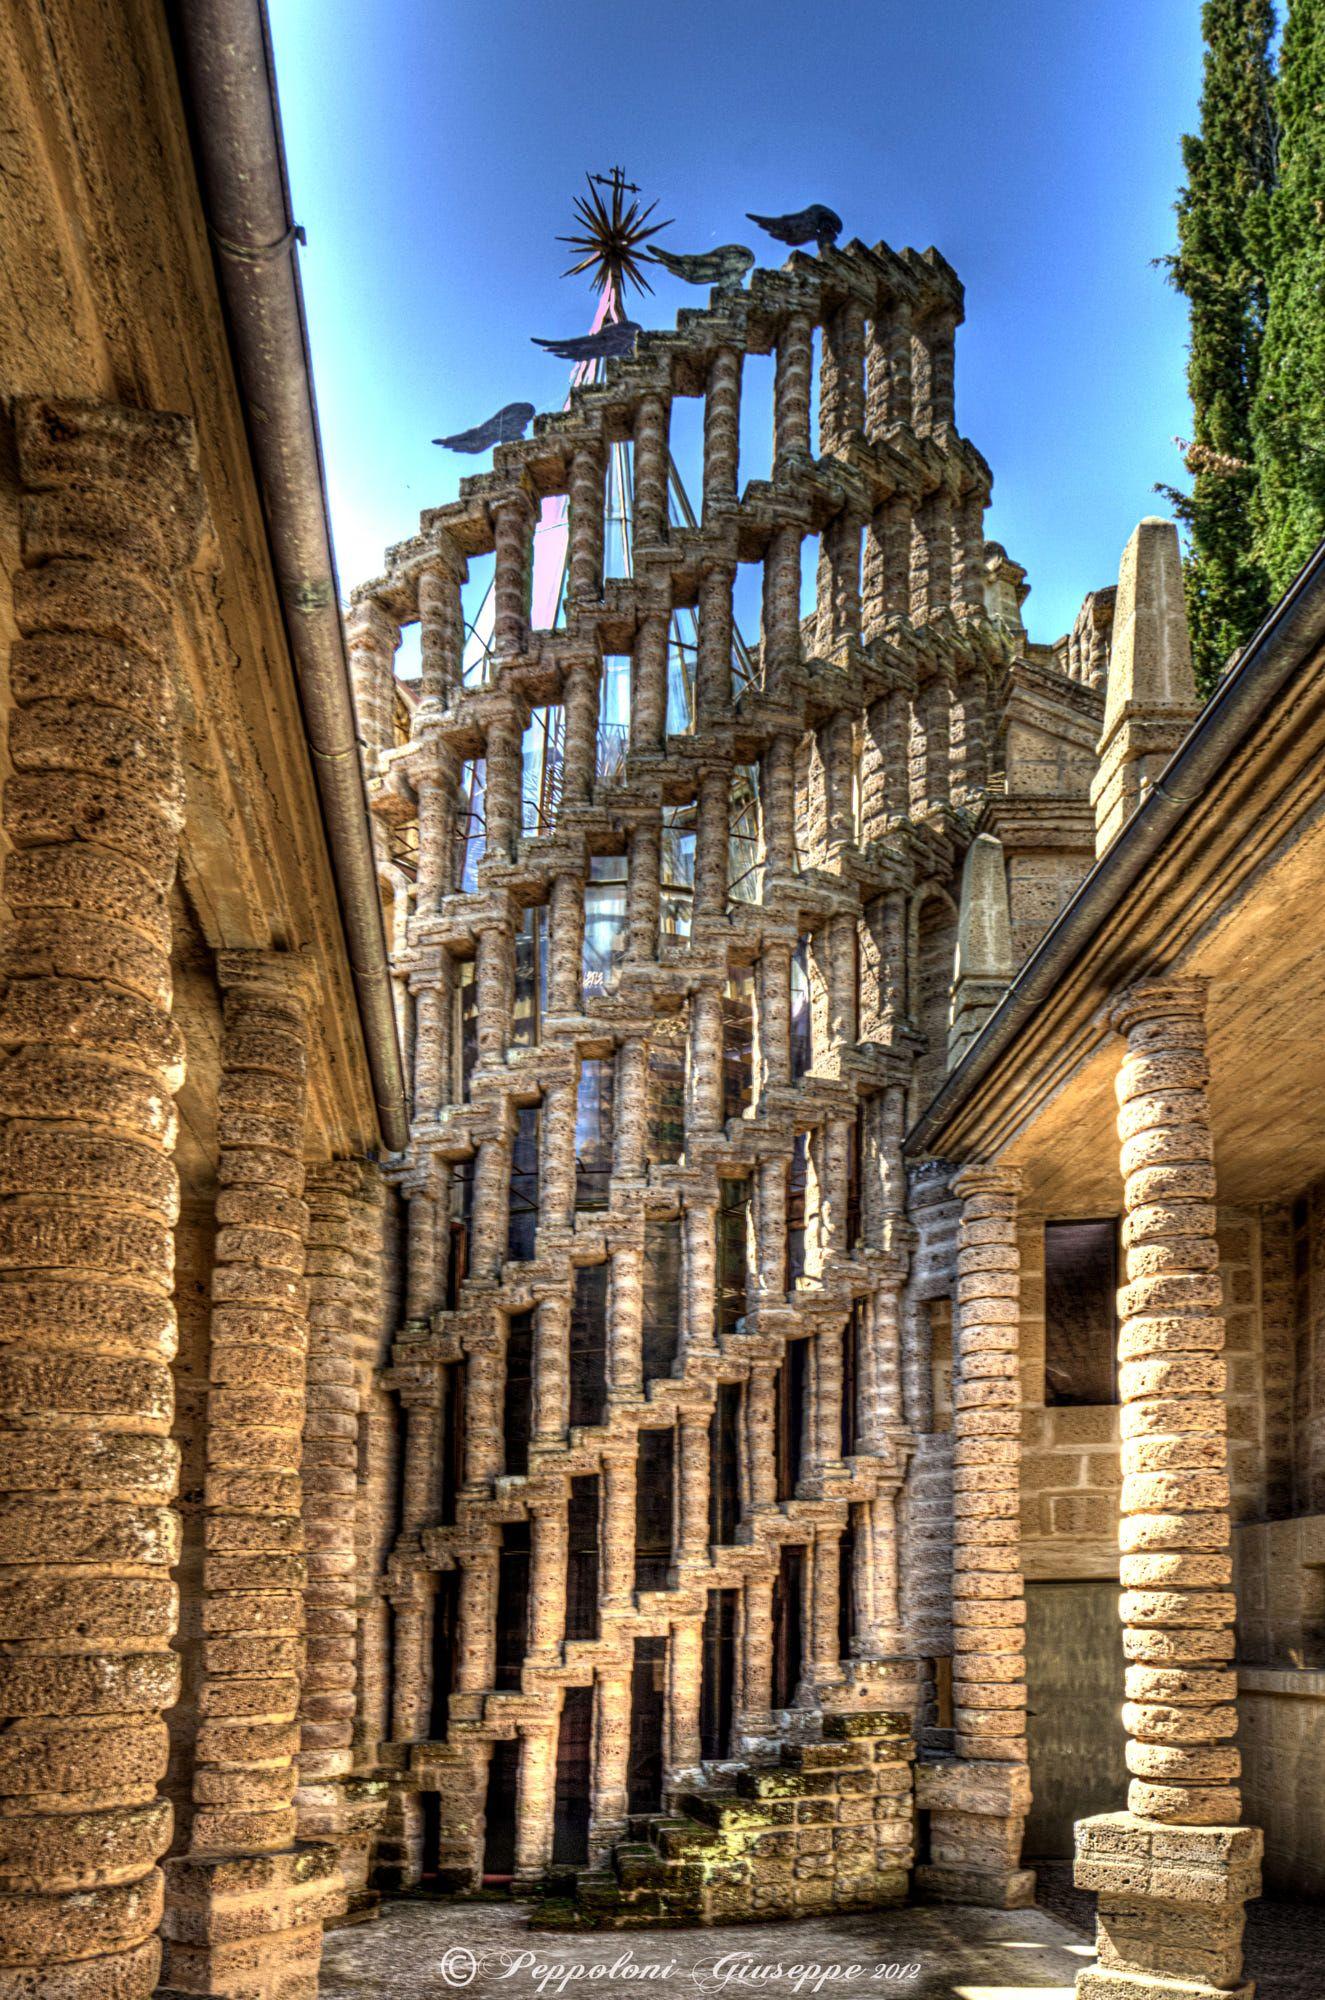 La Scarzuola, Terni, Umbria, Italy. The Ideal City by the ...